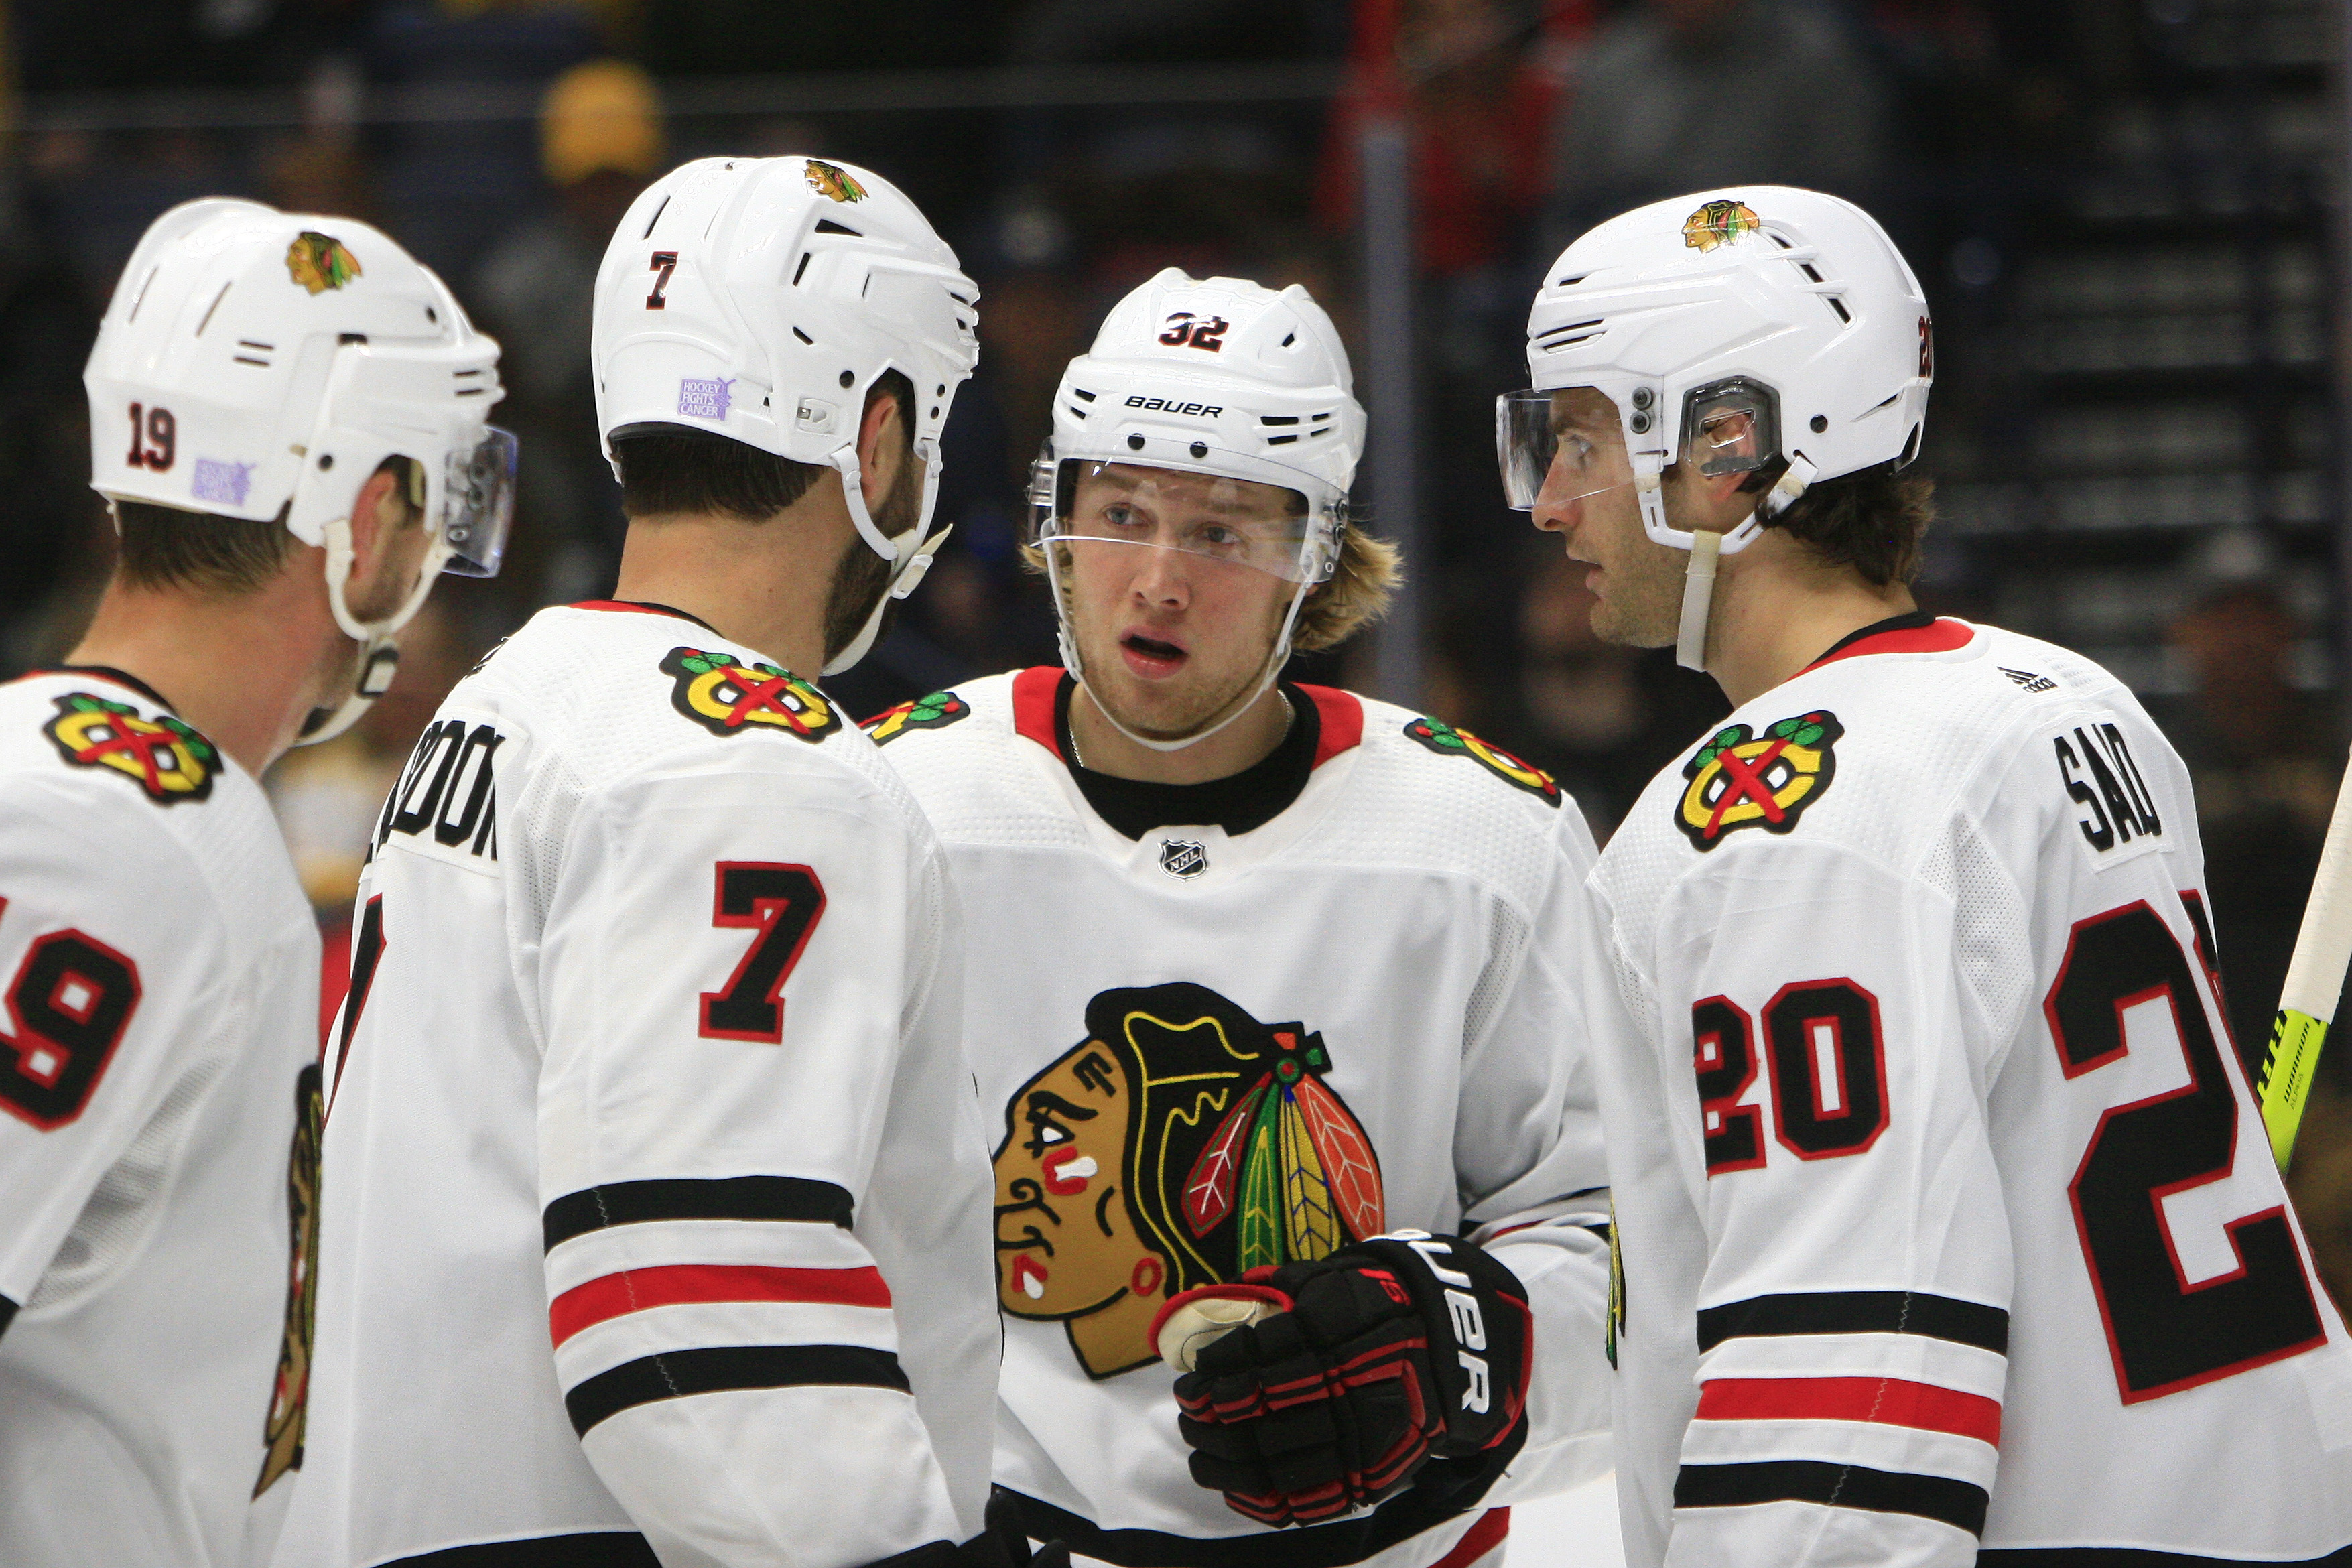 NHL: NOV 16 Blackhawks at Predators